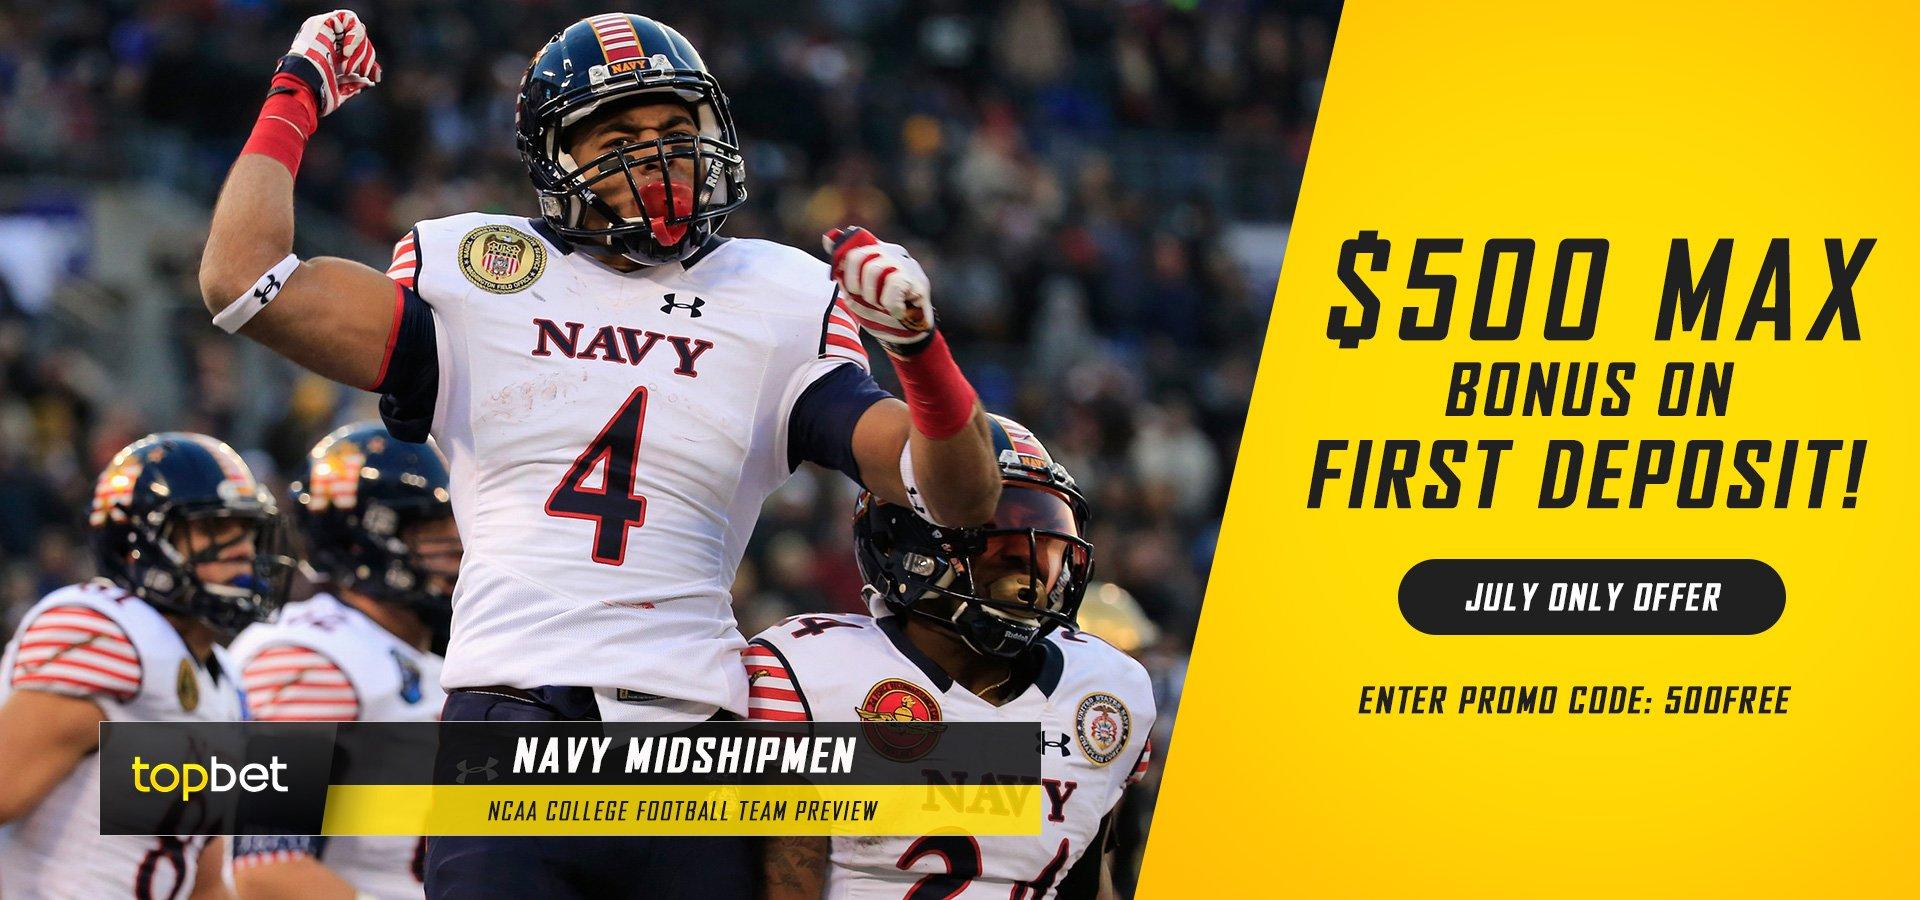 Navy Midshipmen 2016 Football Team Preview